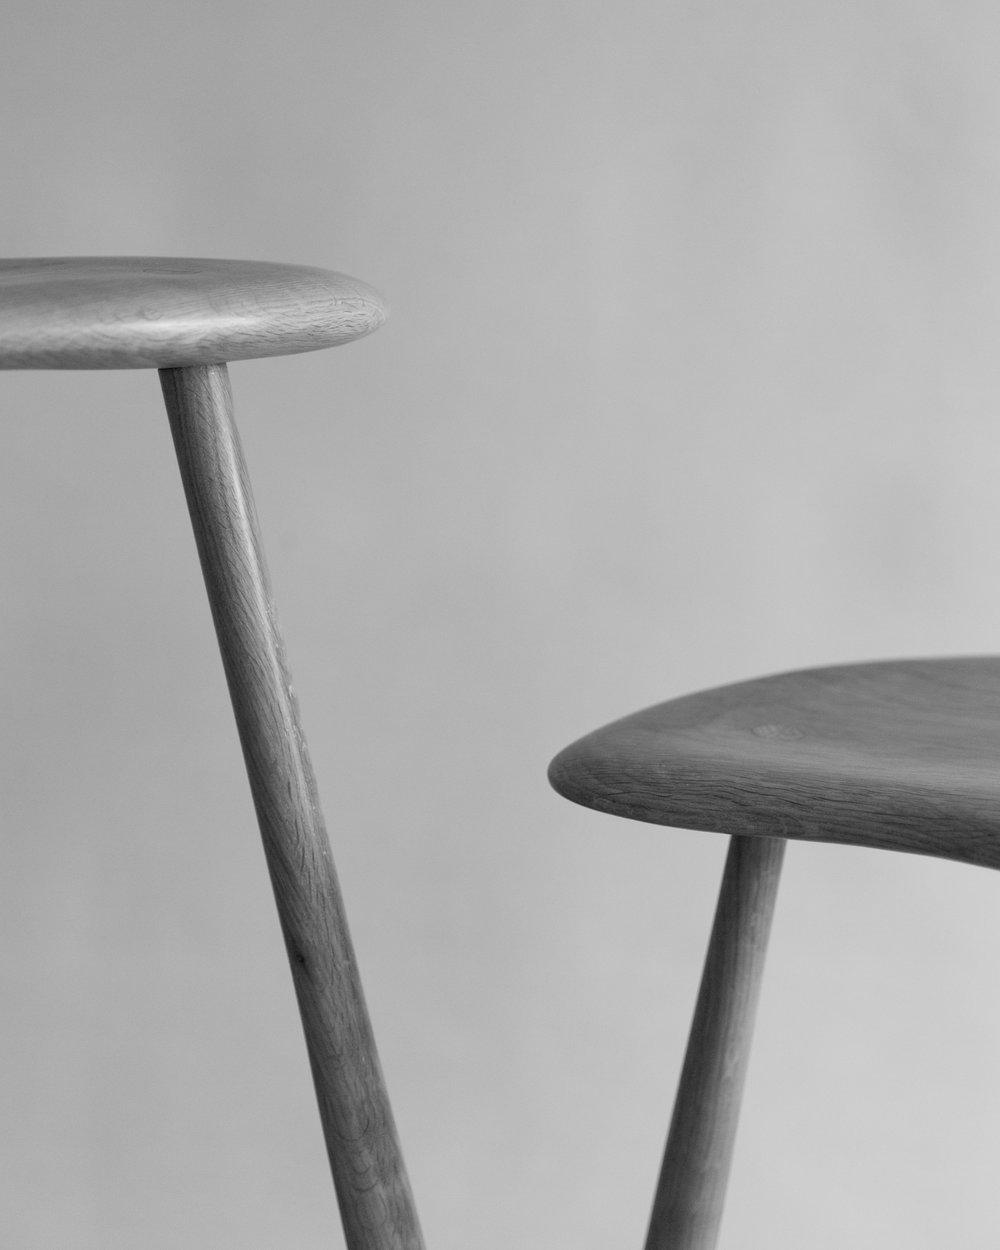 stools-card-35.jpg